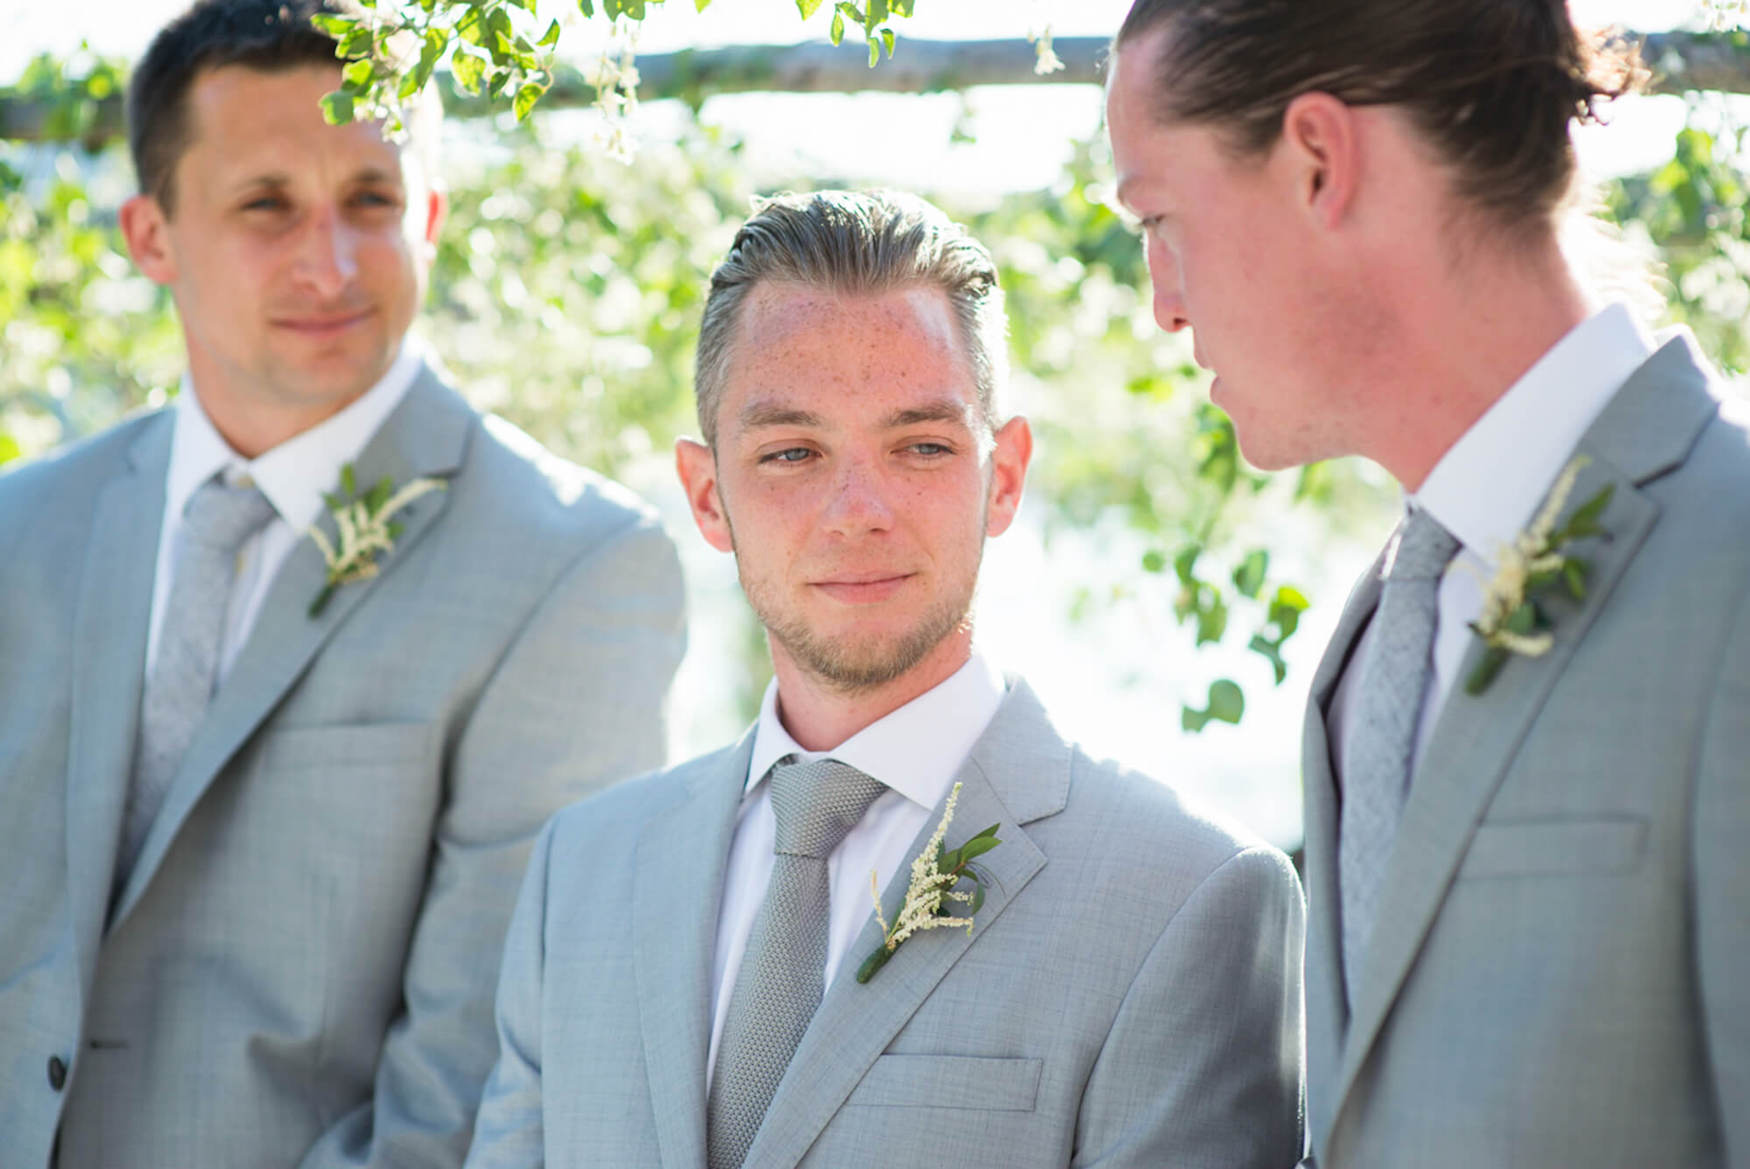 groom waiting beach wedding seaside happy laughter elements benirras amanda wakeley